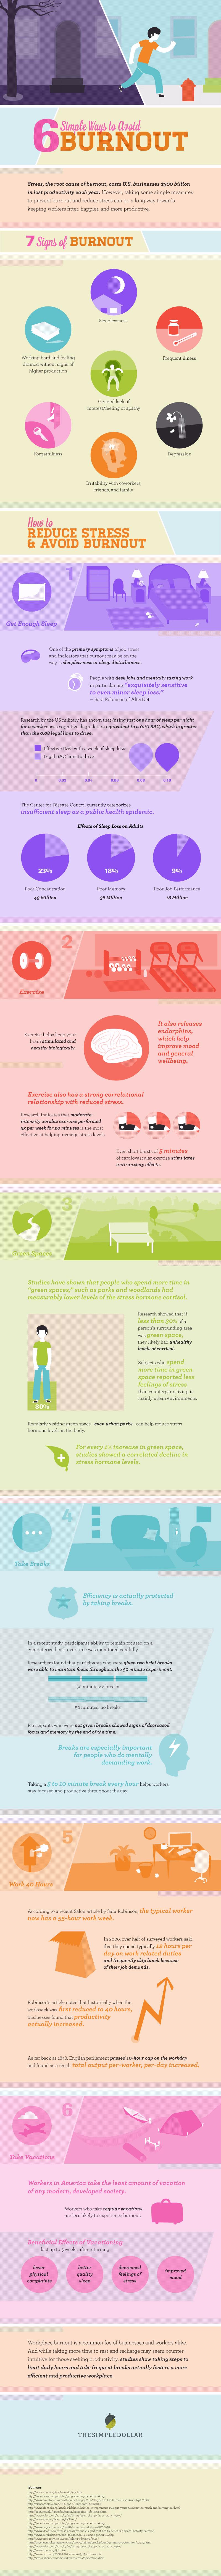 Six Ways to Avoid Burnout